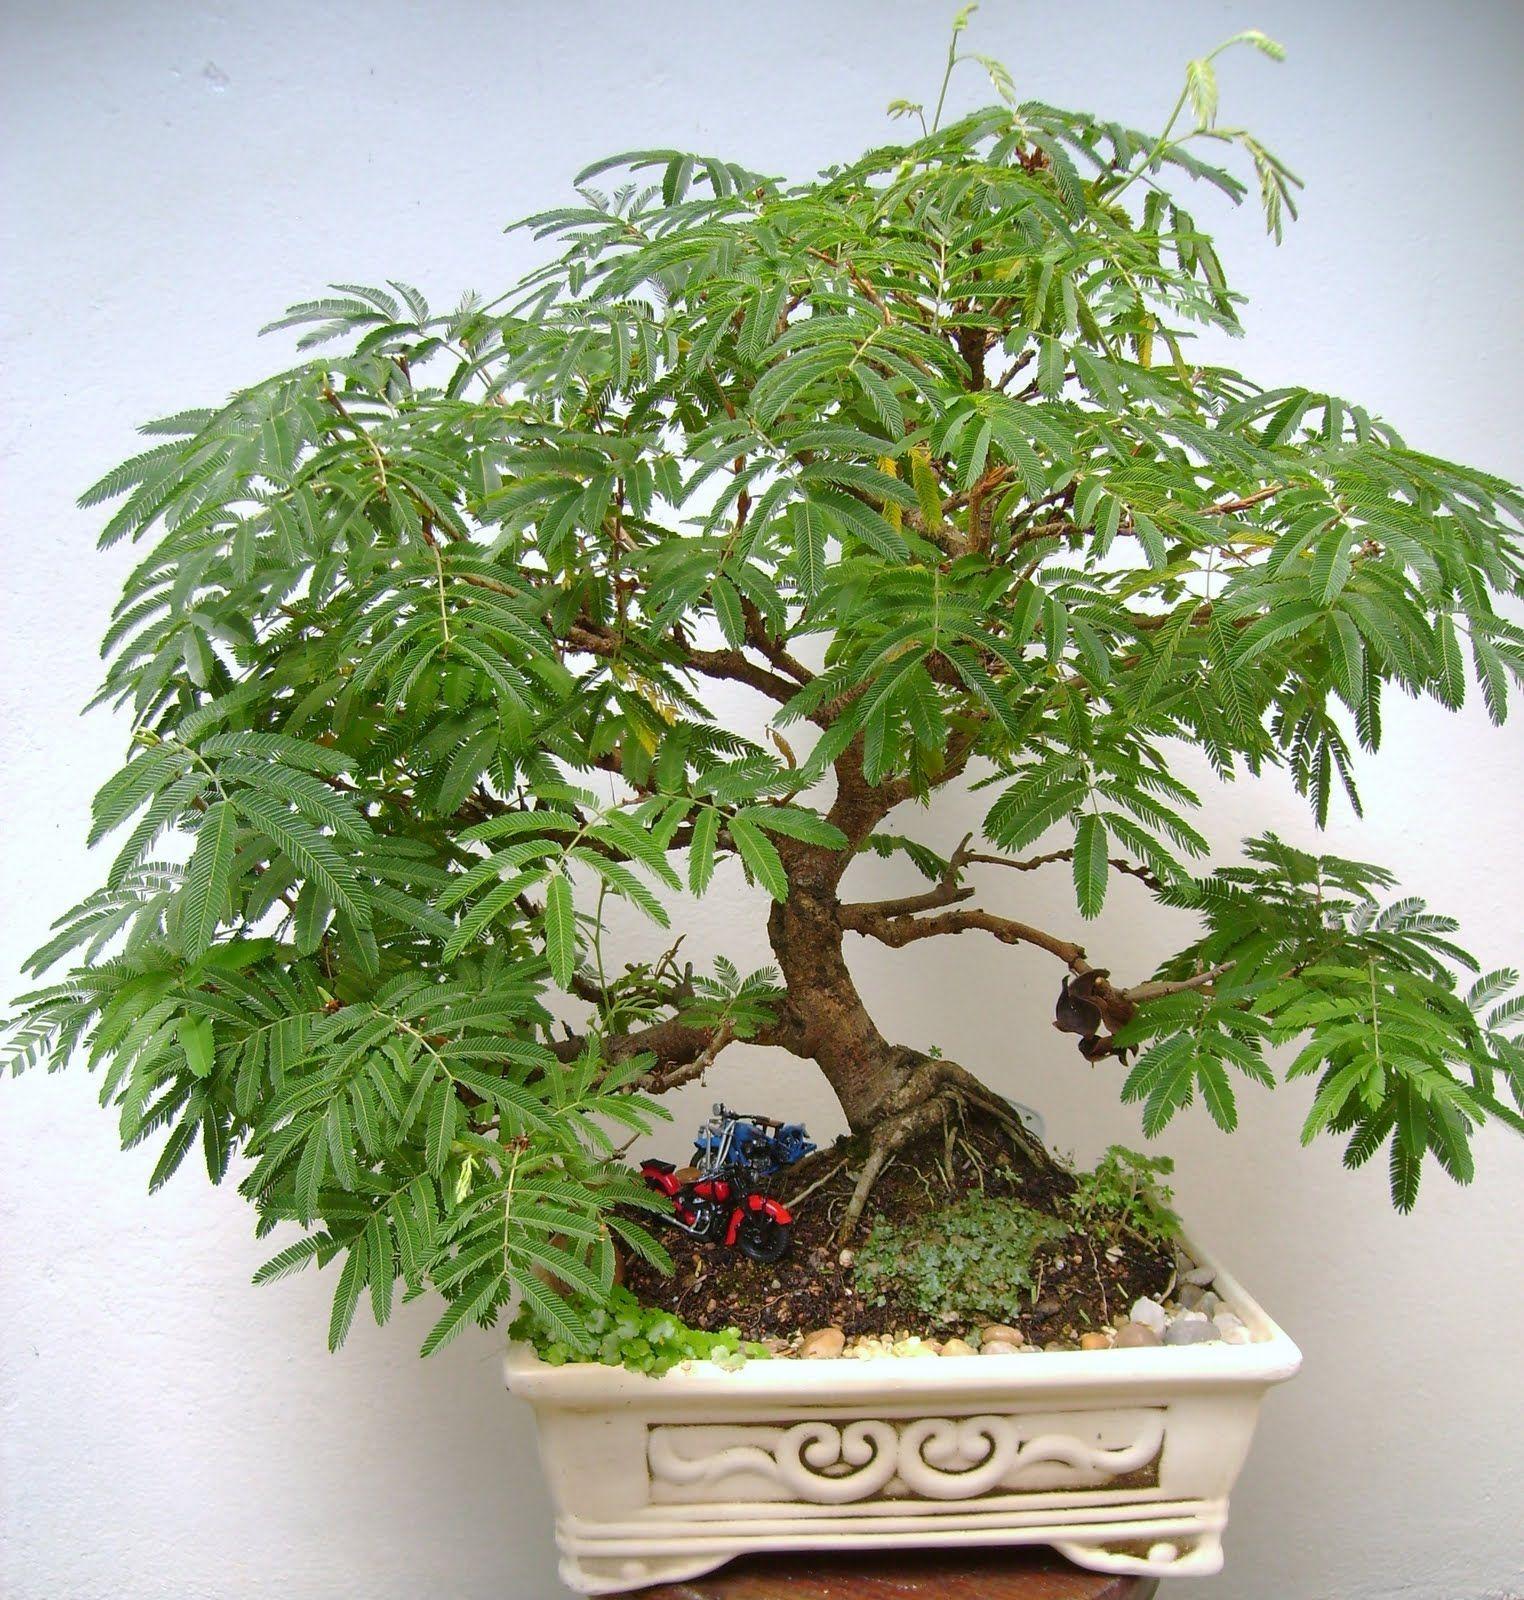 caliandra bonsai bonsai shohin bonsai penjing pinterest moos pflanzen bonsai baum und moos. Black Bedroom Furniture Sets. Home Design Ideas